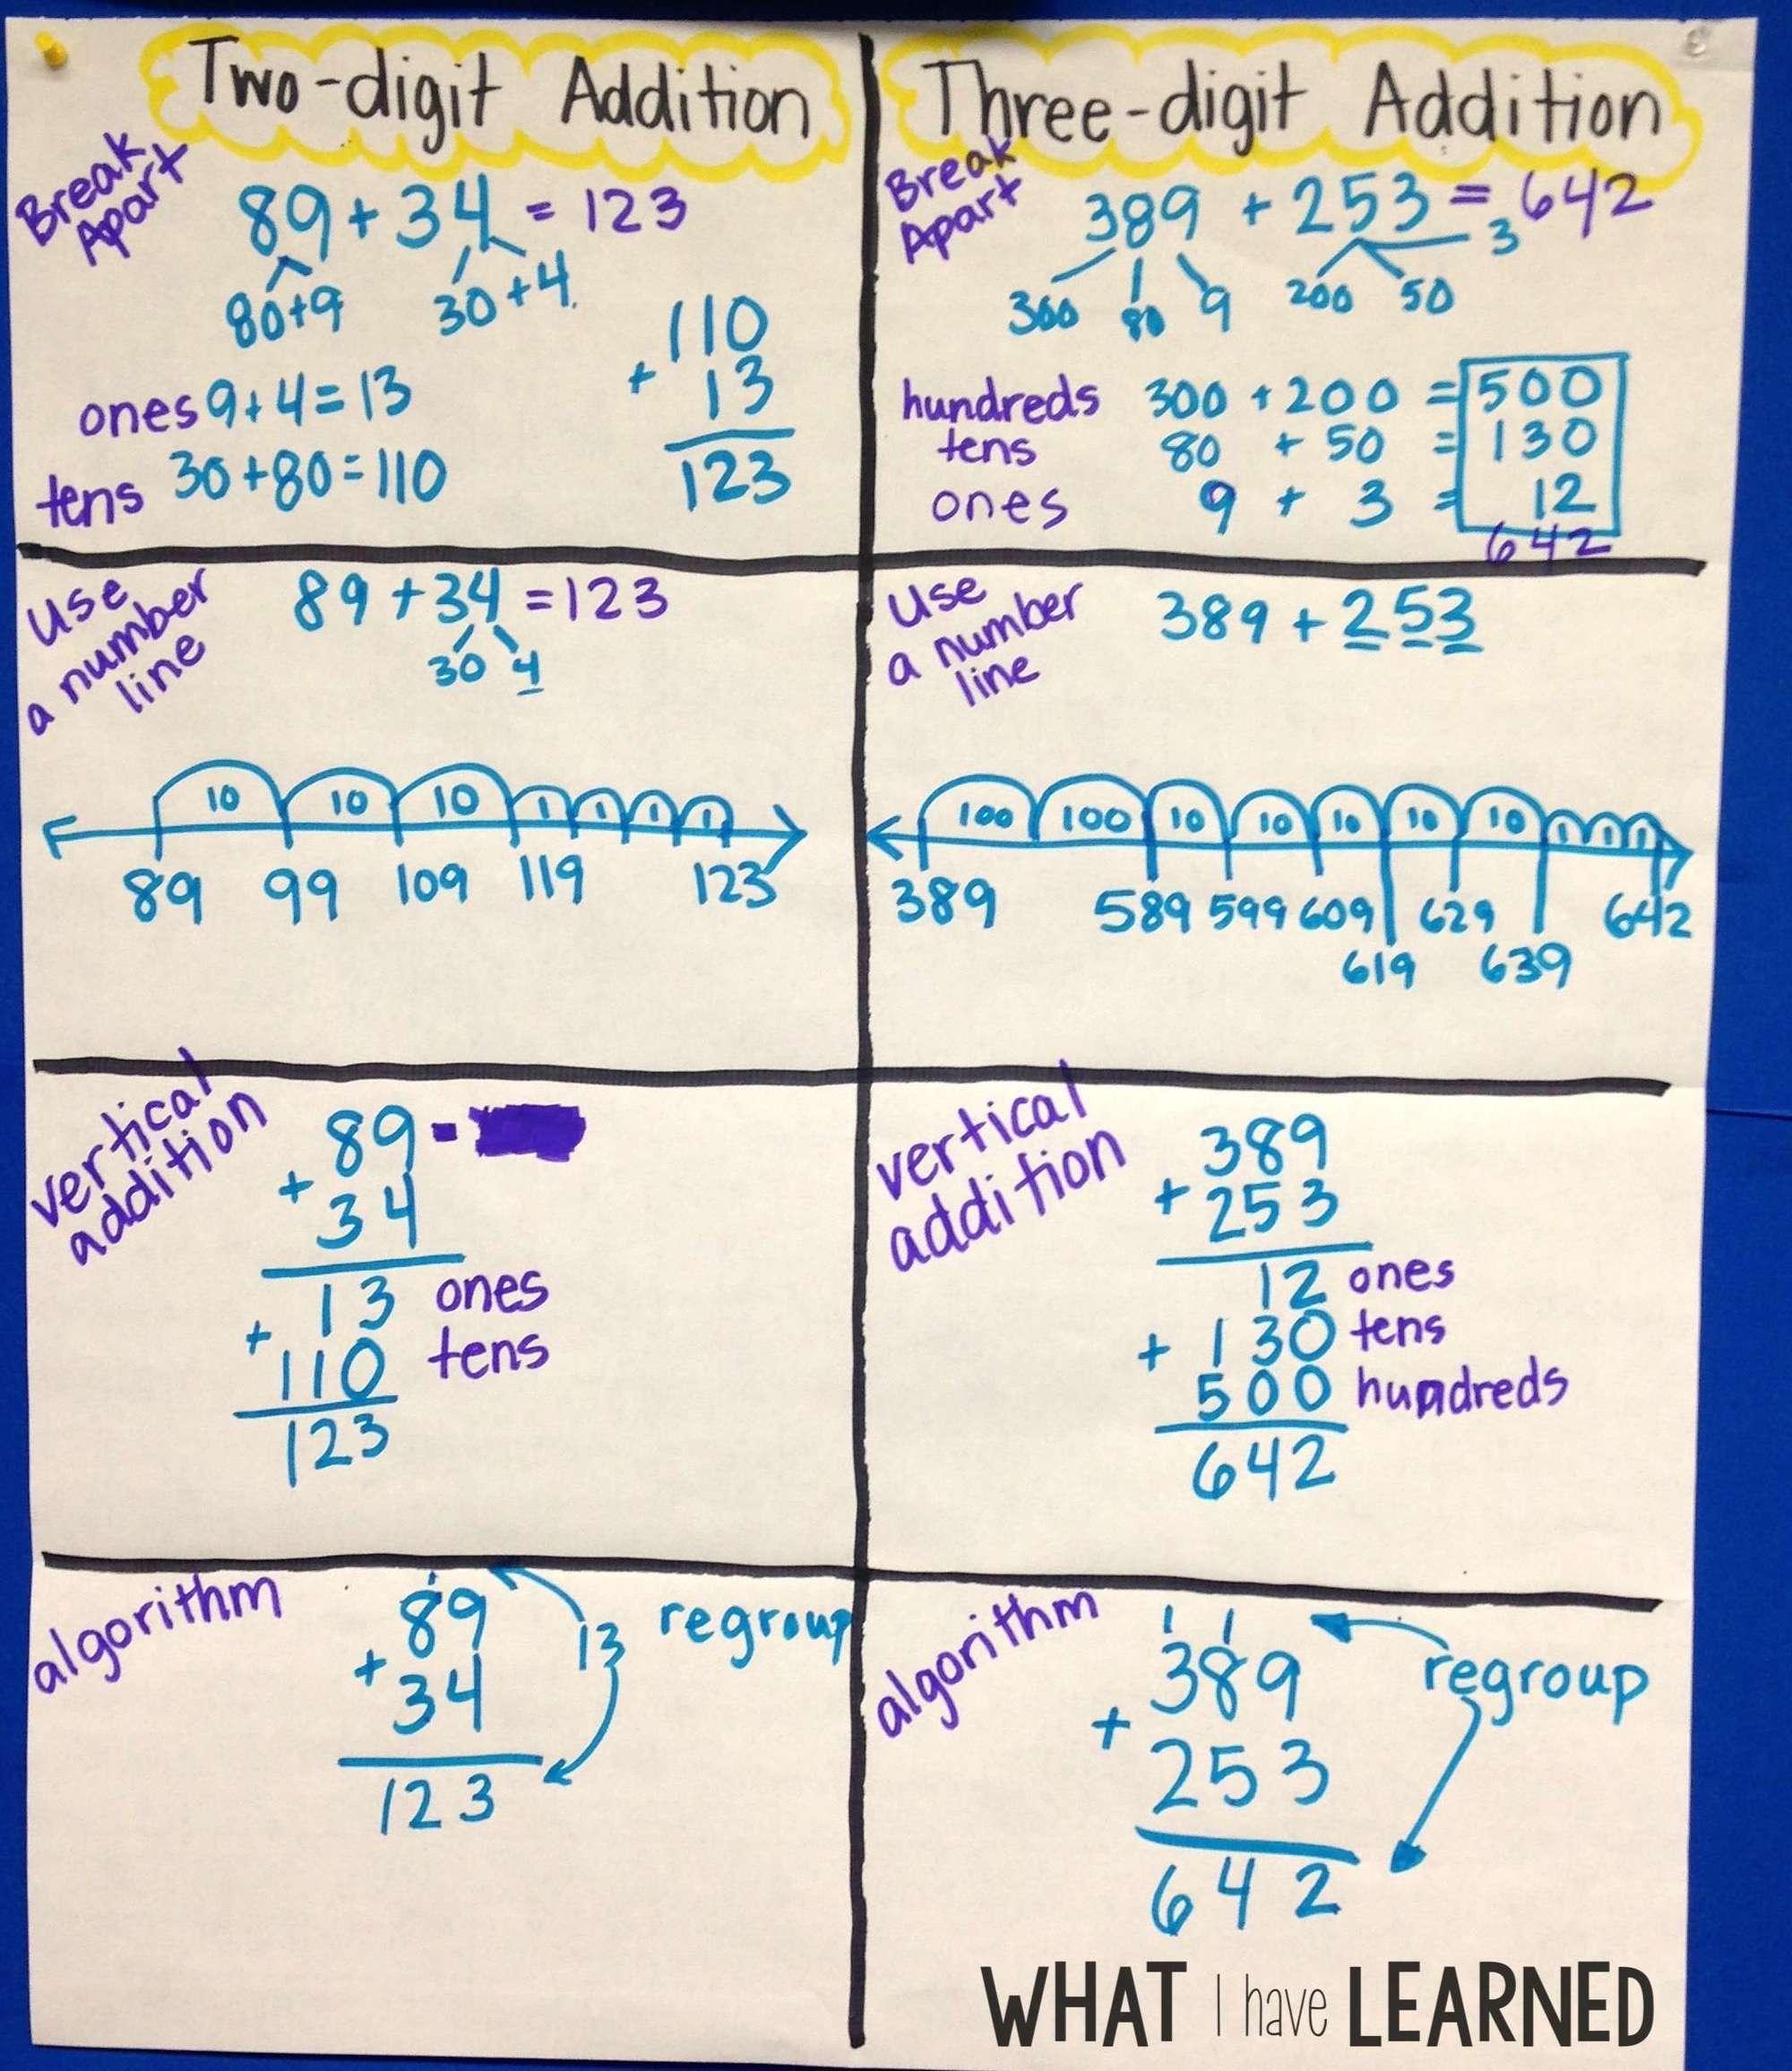 medium resolution of Ways to solve multi-digit addition problems